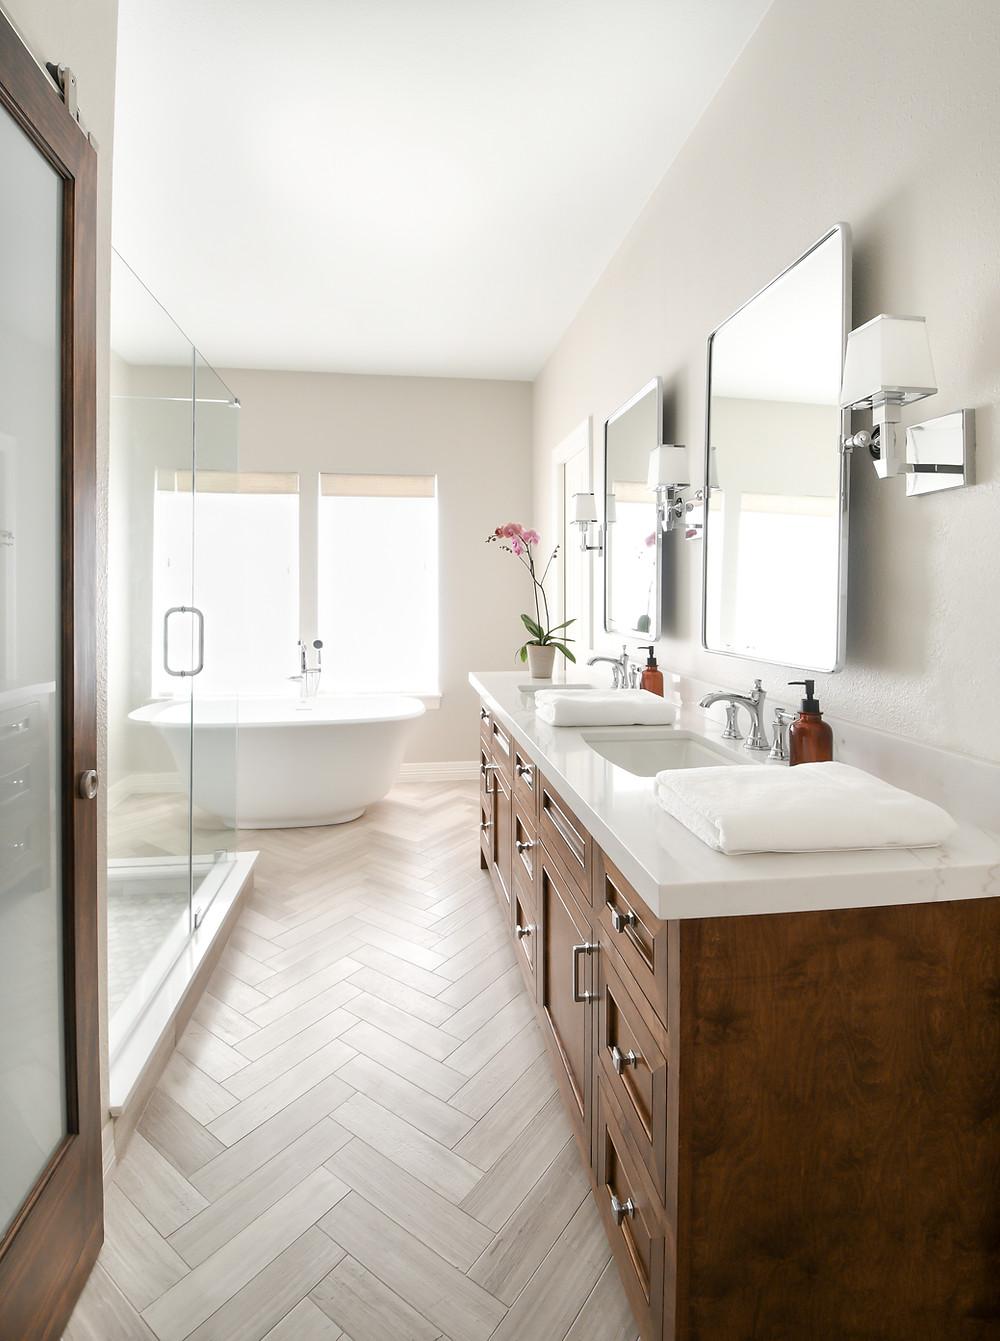 Modern transitional bathroom by Houston interior design firm Nancy Lane Interiors